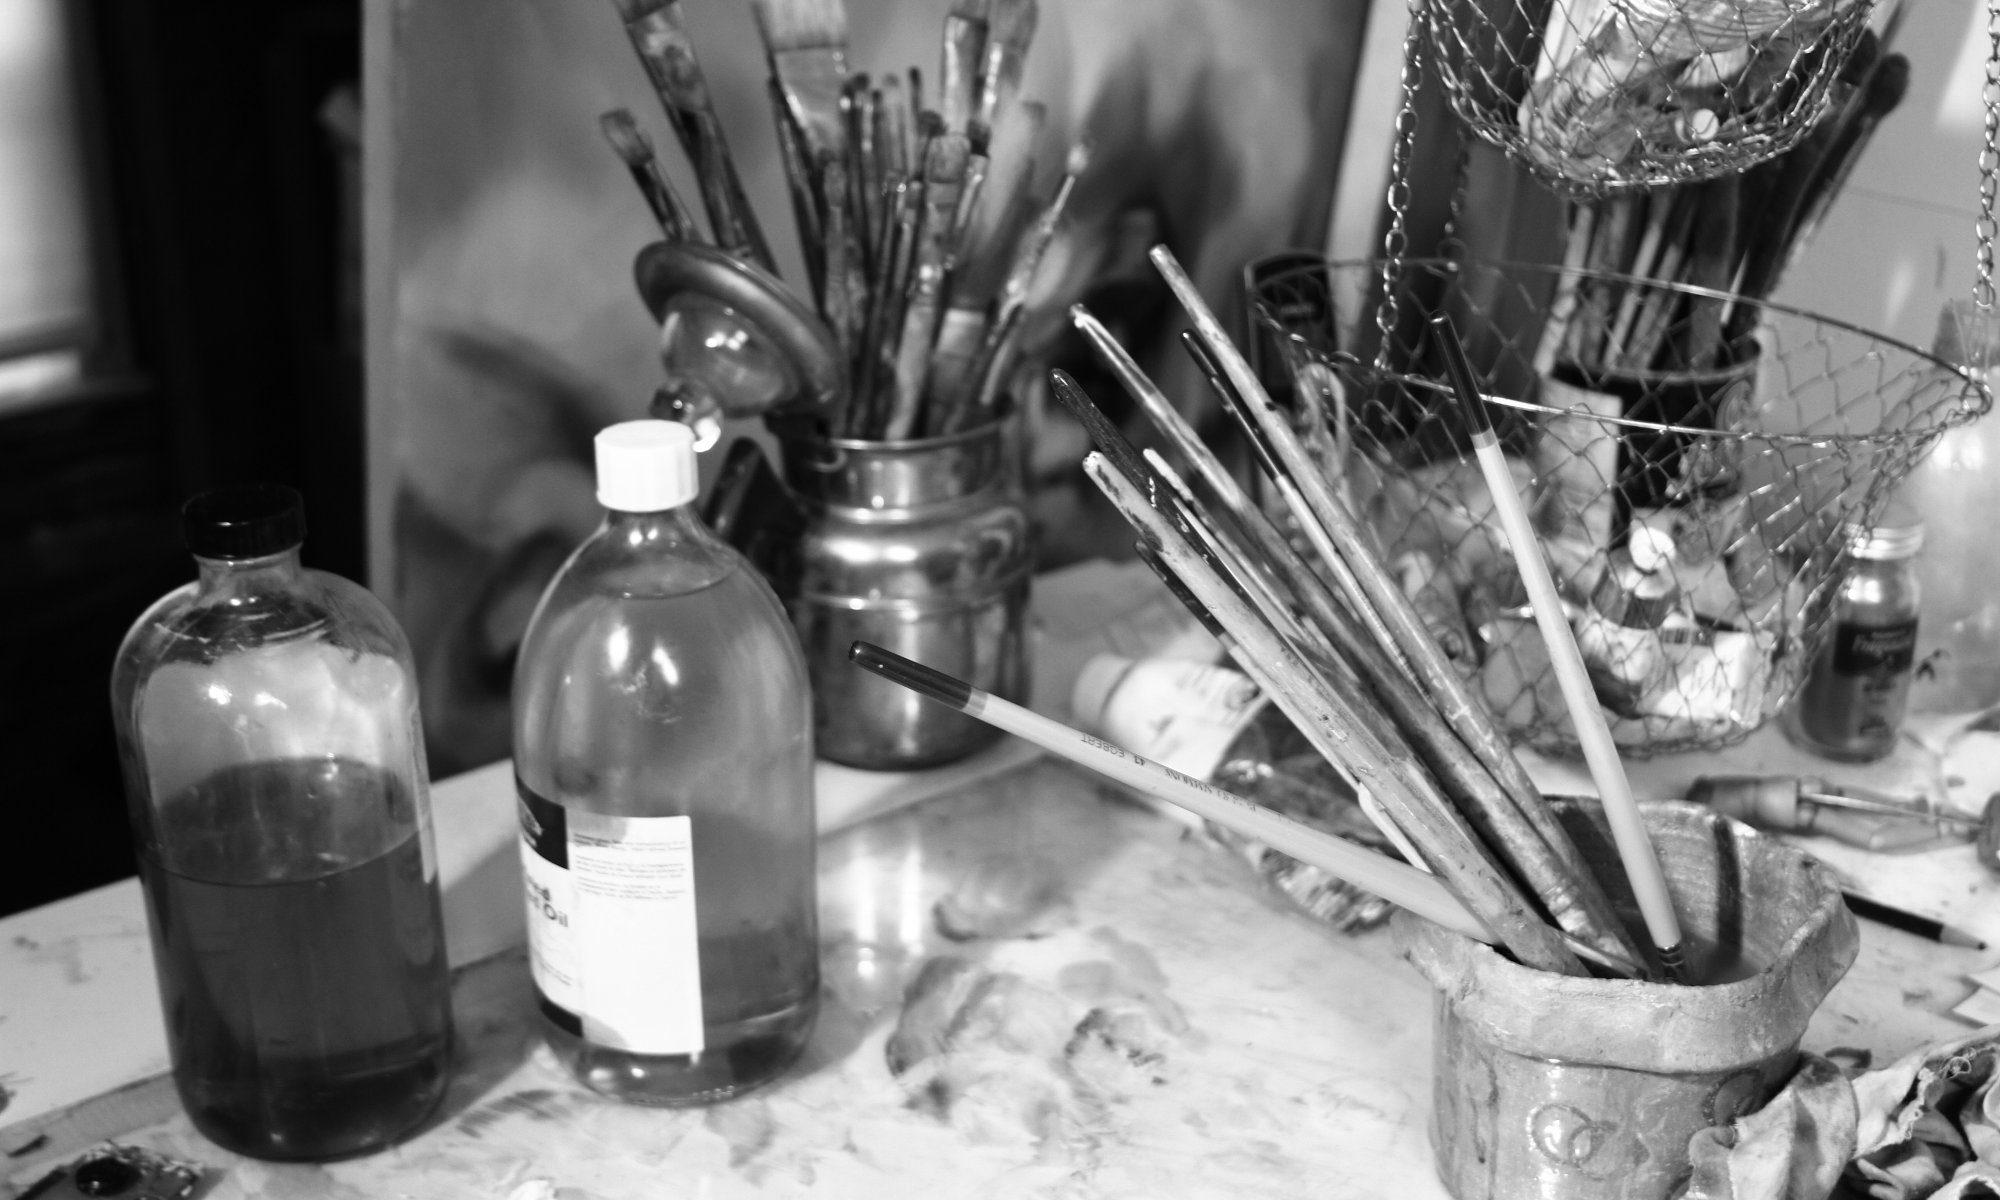 Studio in Black and White